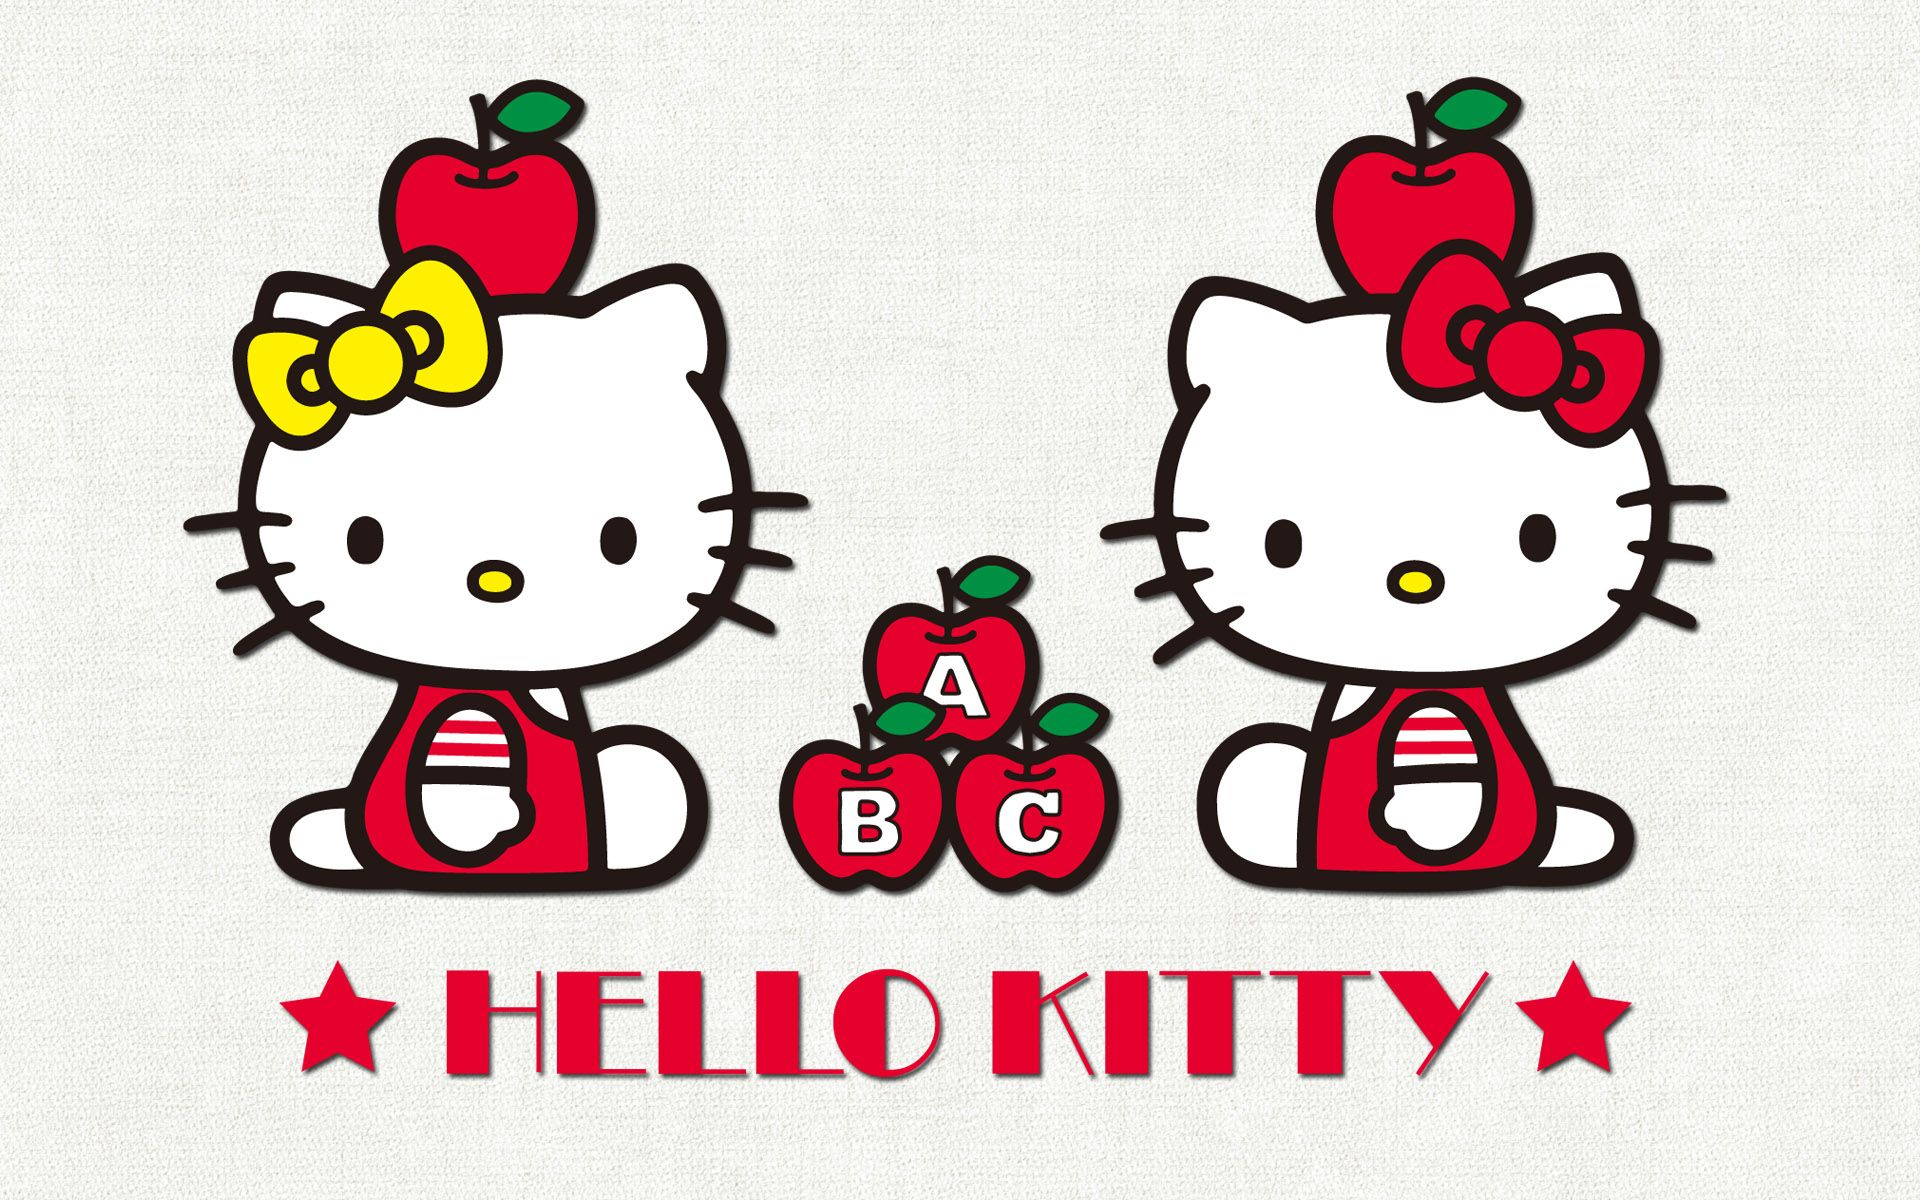 Hello Kitty Wallpaper Wallpapers Hello Kitty Cartoon Hello Kitty Wallpaper Hello Kitty